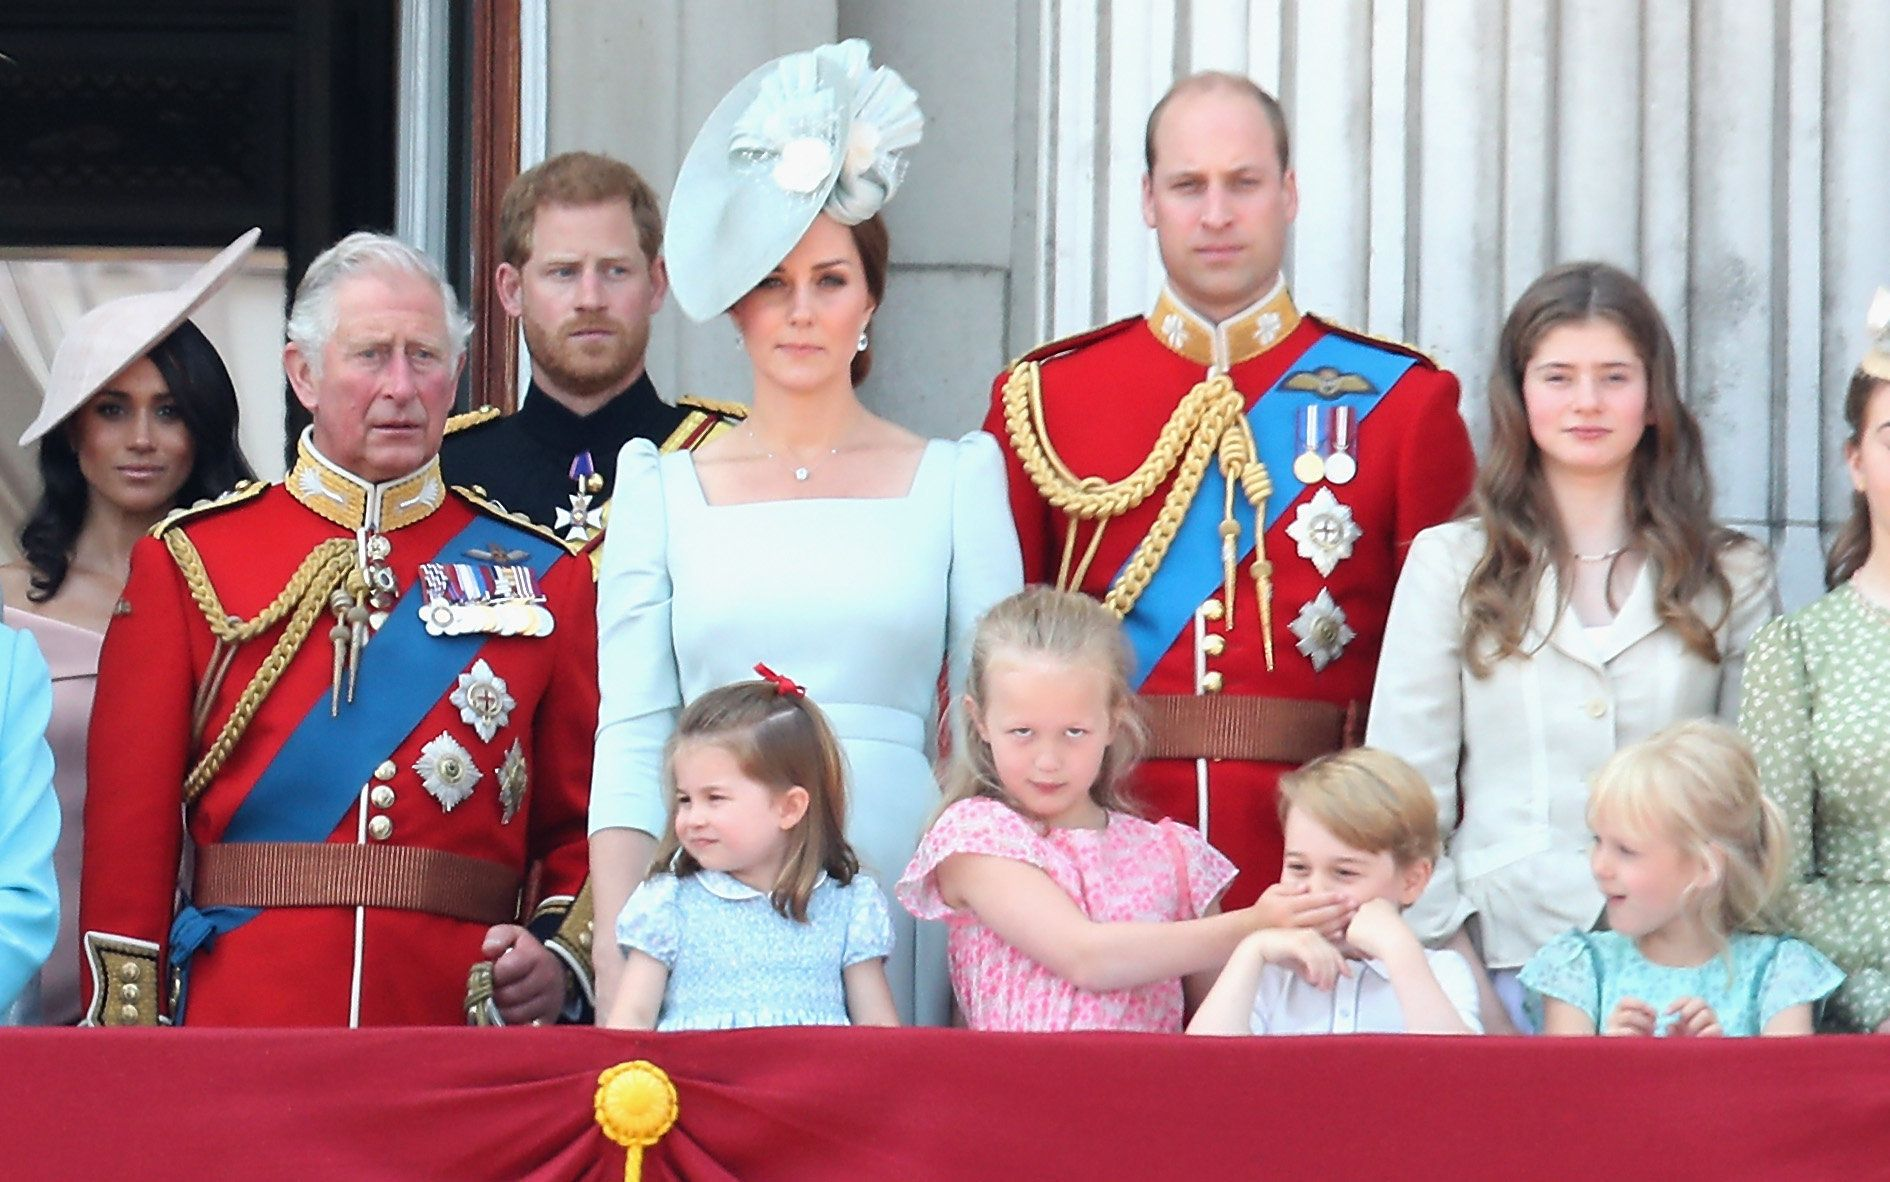 Experte: Deshalb trägt Herzogin Kate dieselbe Farbe wie Prinzessin